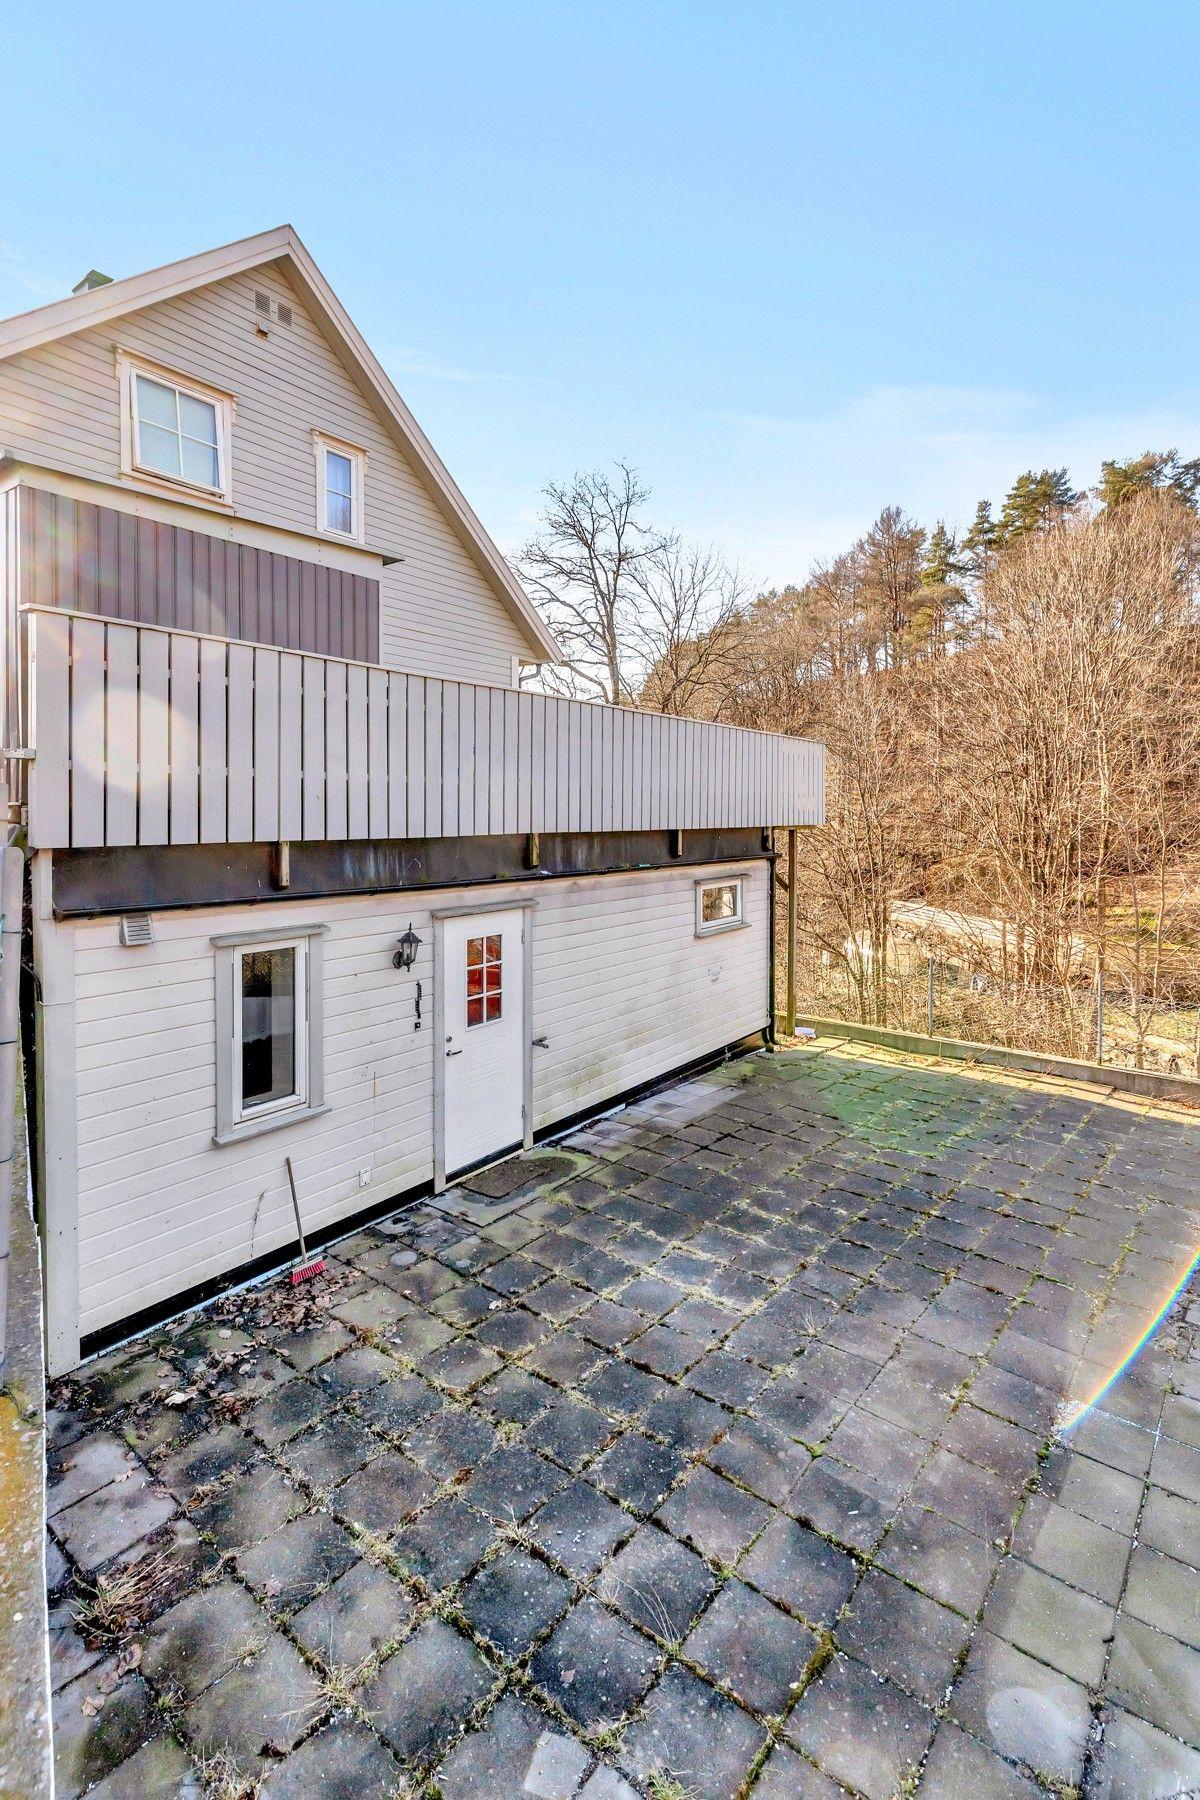 Barbugårdsveien 49J, Arendal | Sørmegleren